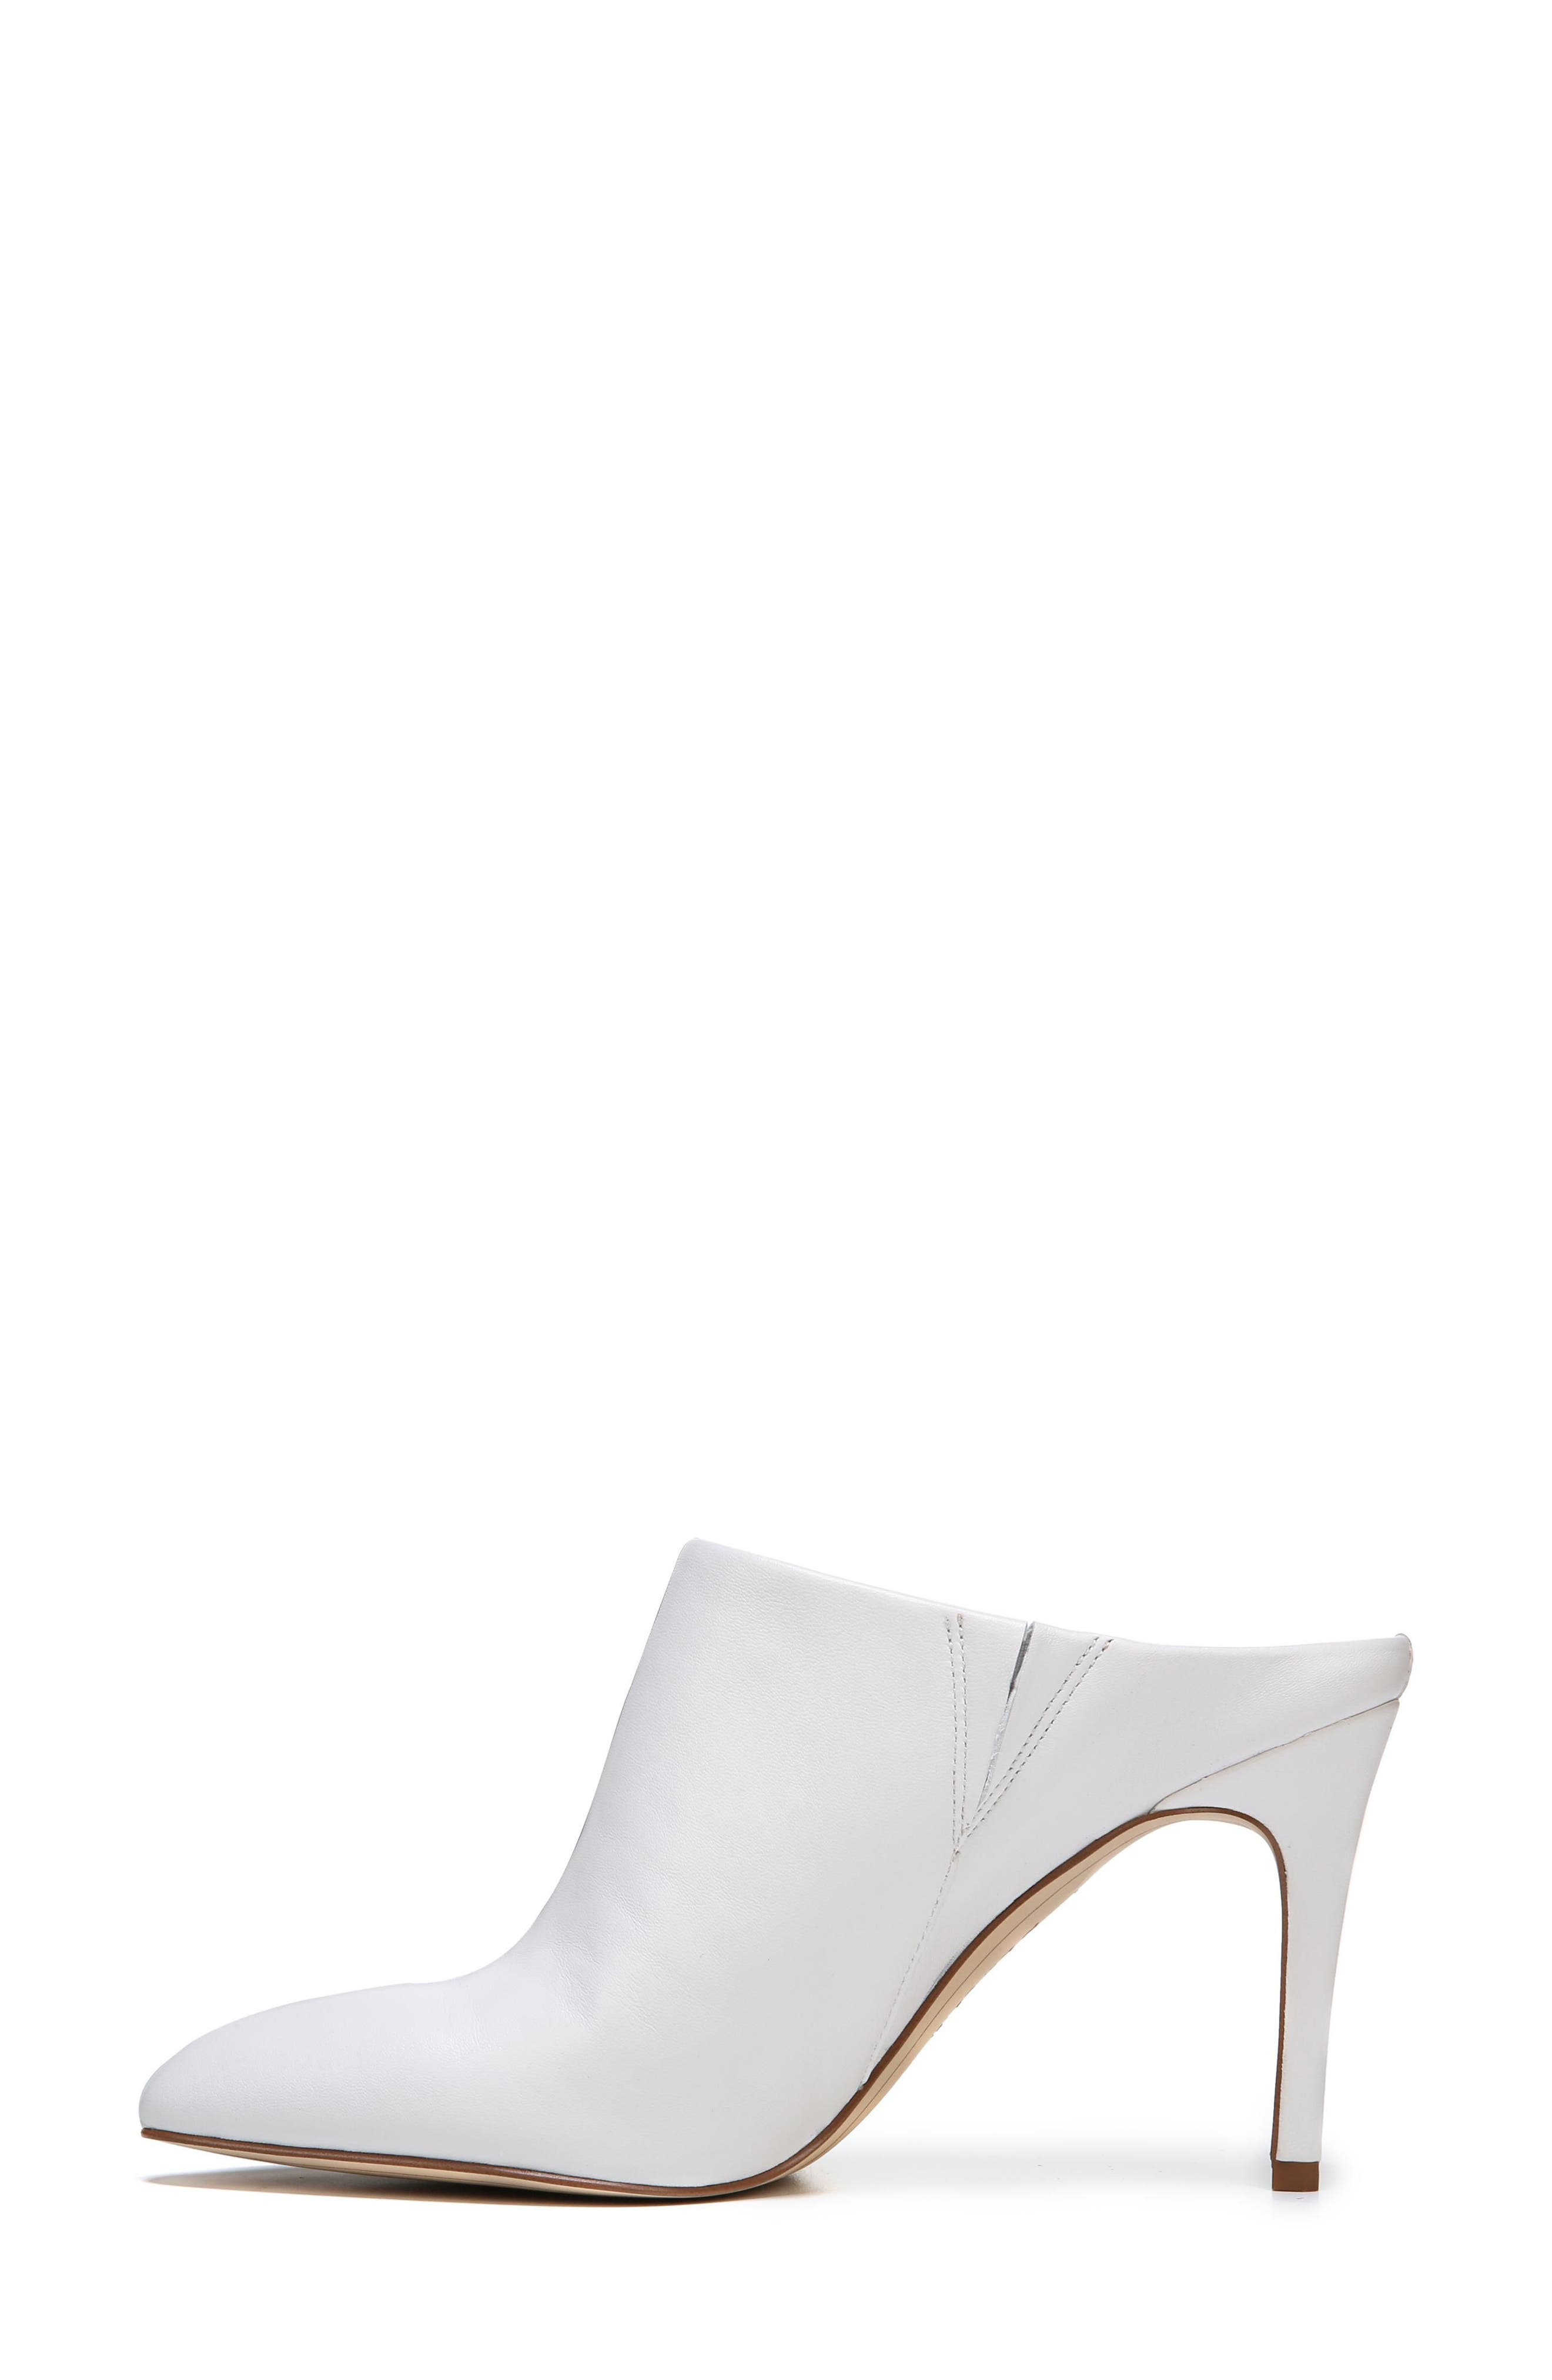 Oran Mule,                             Alternate thumbnail 4, color,                             Bright White Nappa Leather